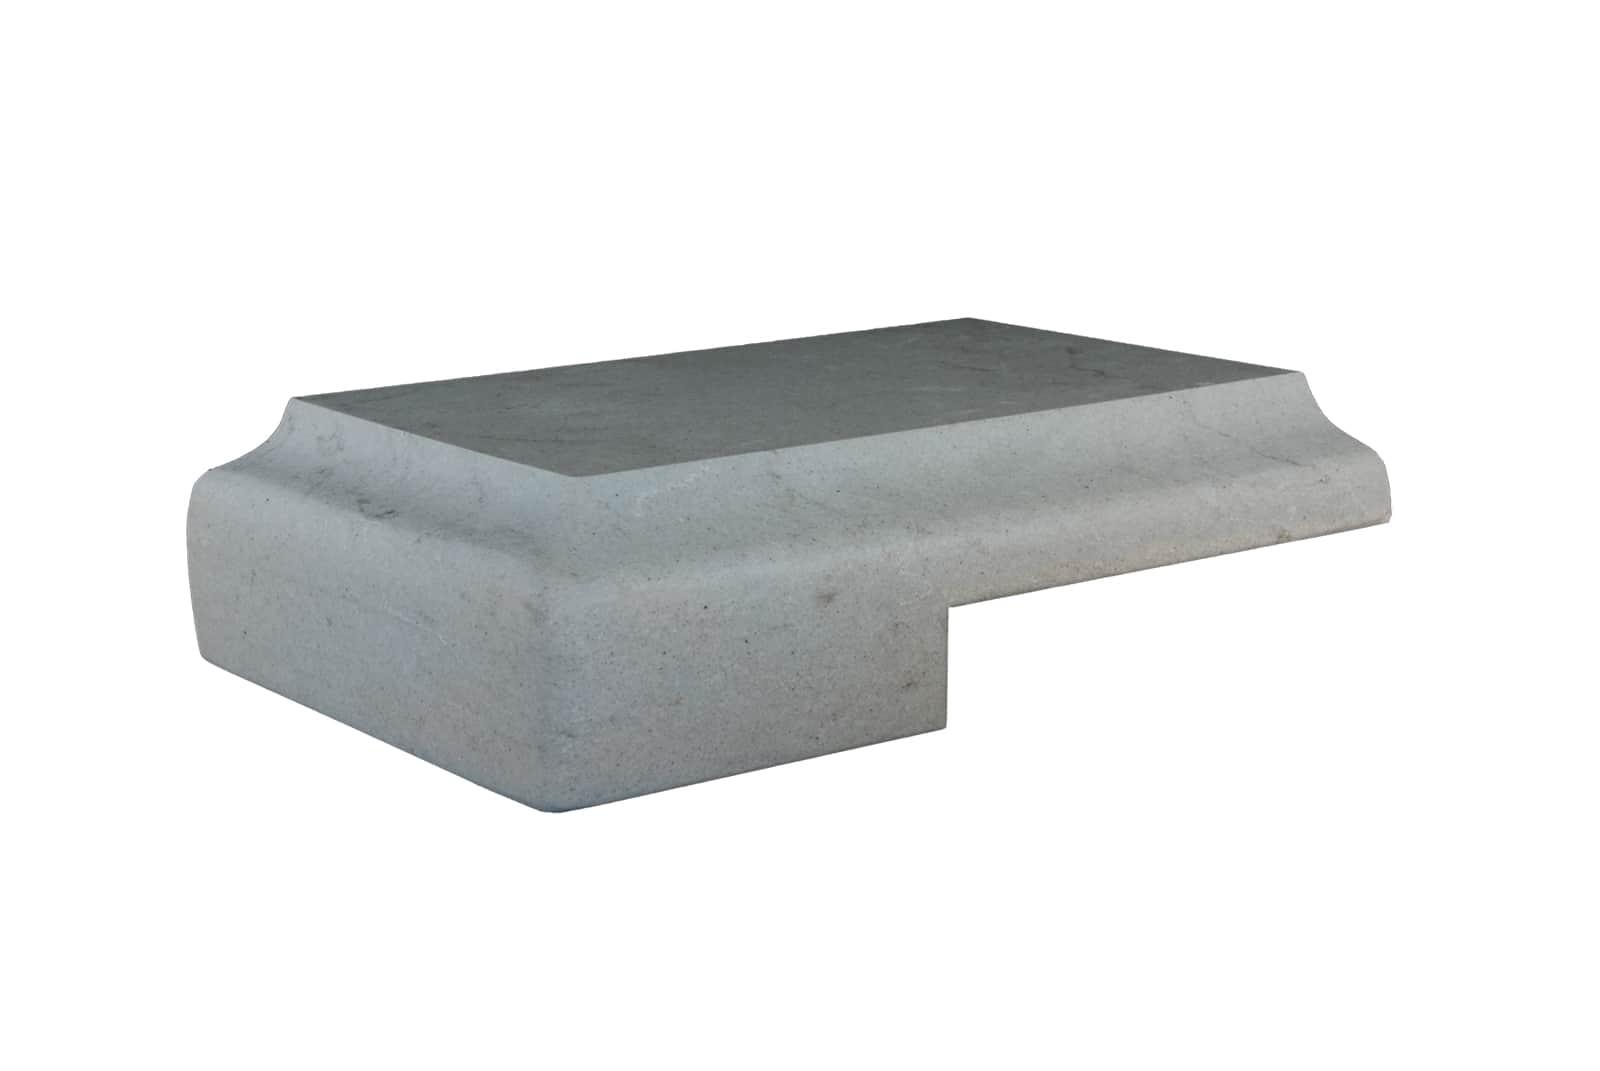 artistic-granite-designs-edges-fabrications-1-half-ogee-flat-bevel-6077